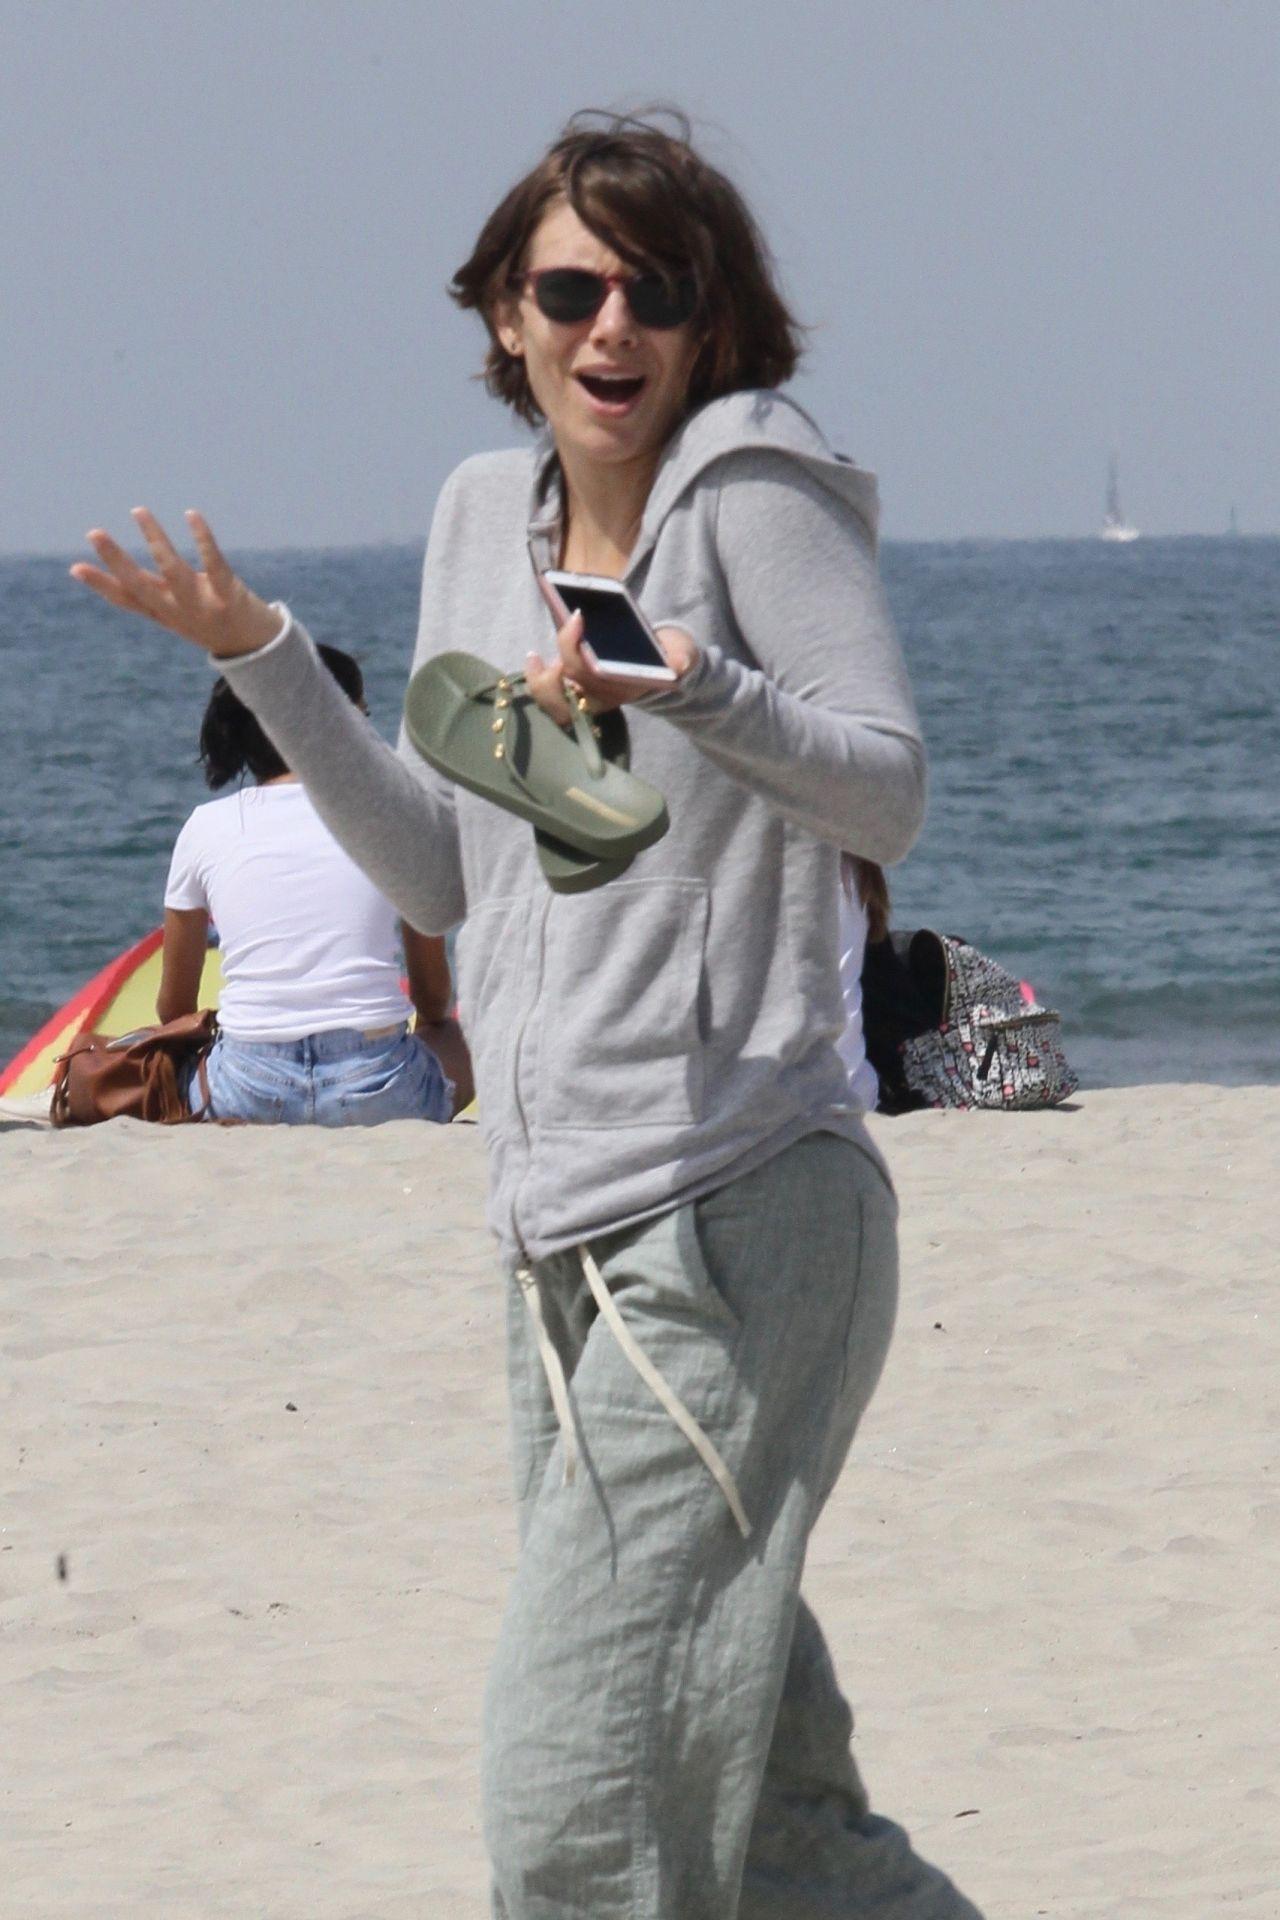 Lauren Cohan And Alanna Masterson At Coronado Beach In San